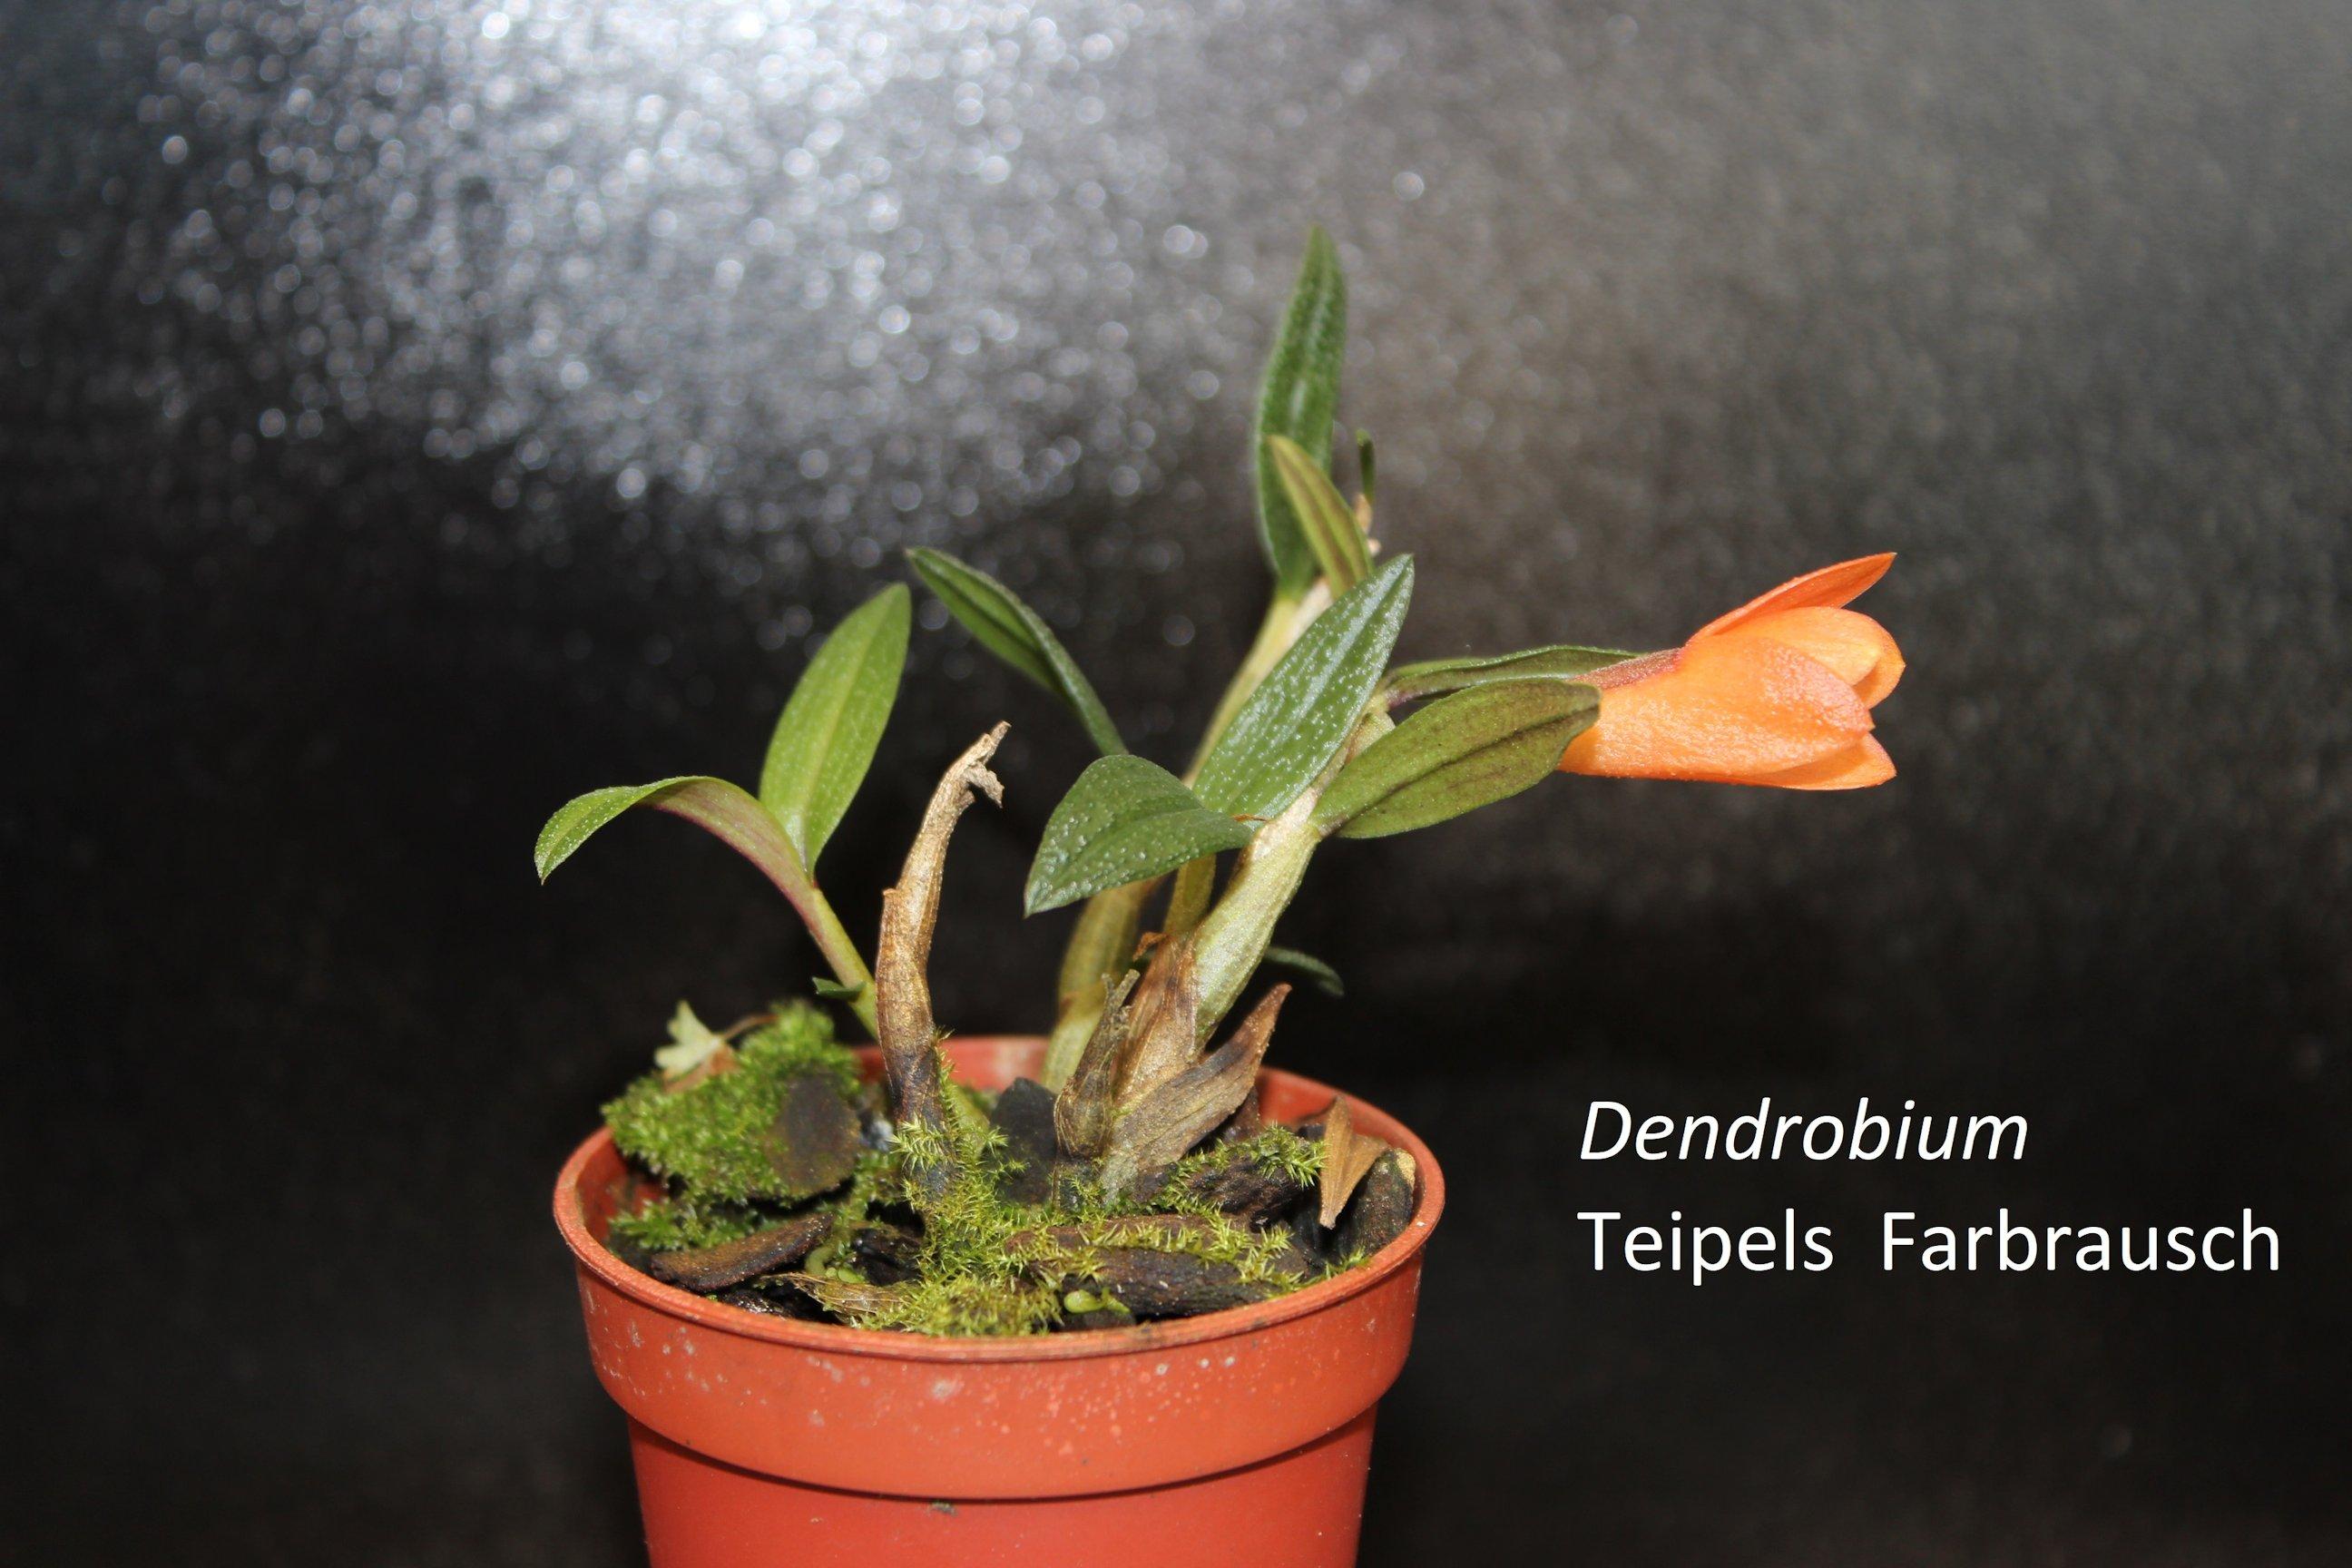 Dendrobium Teipels Farbrausch 18062305411918944715774697